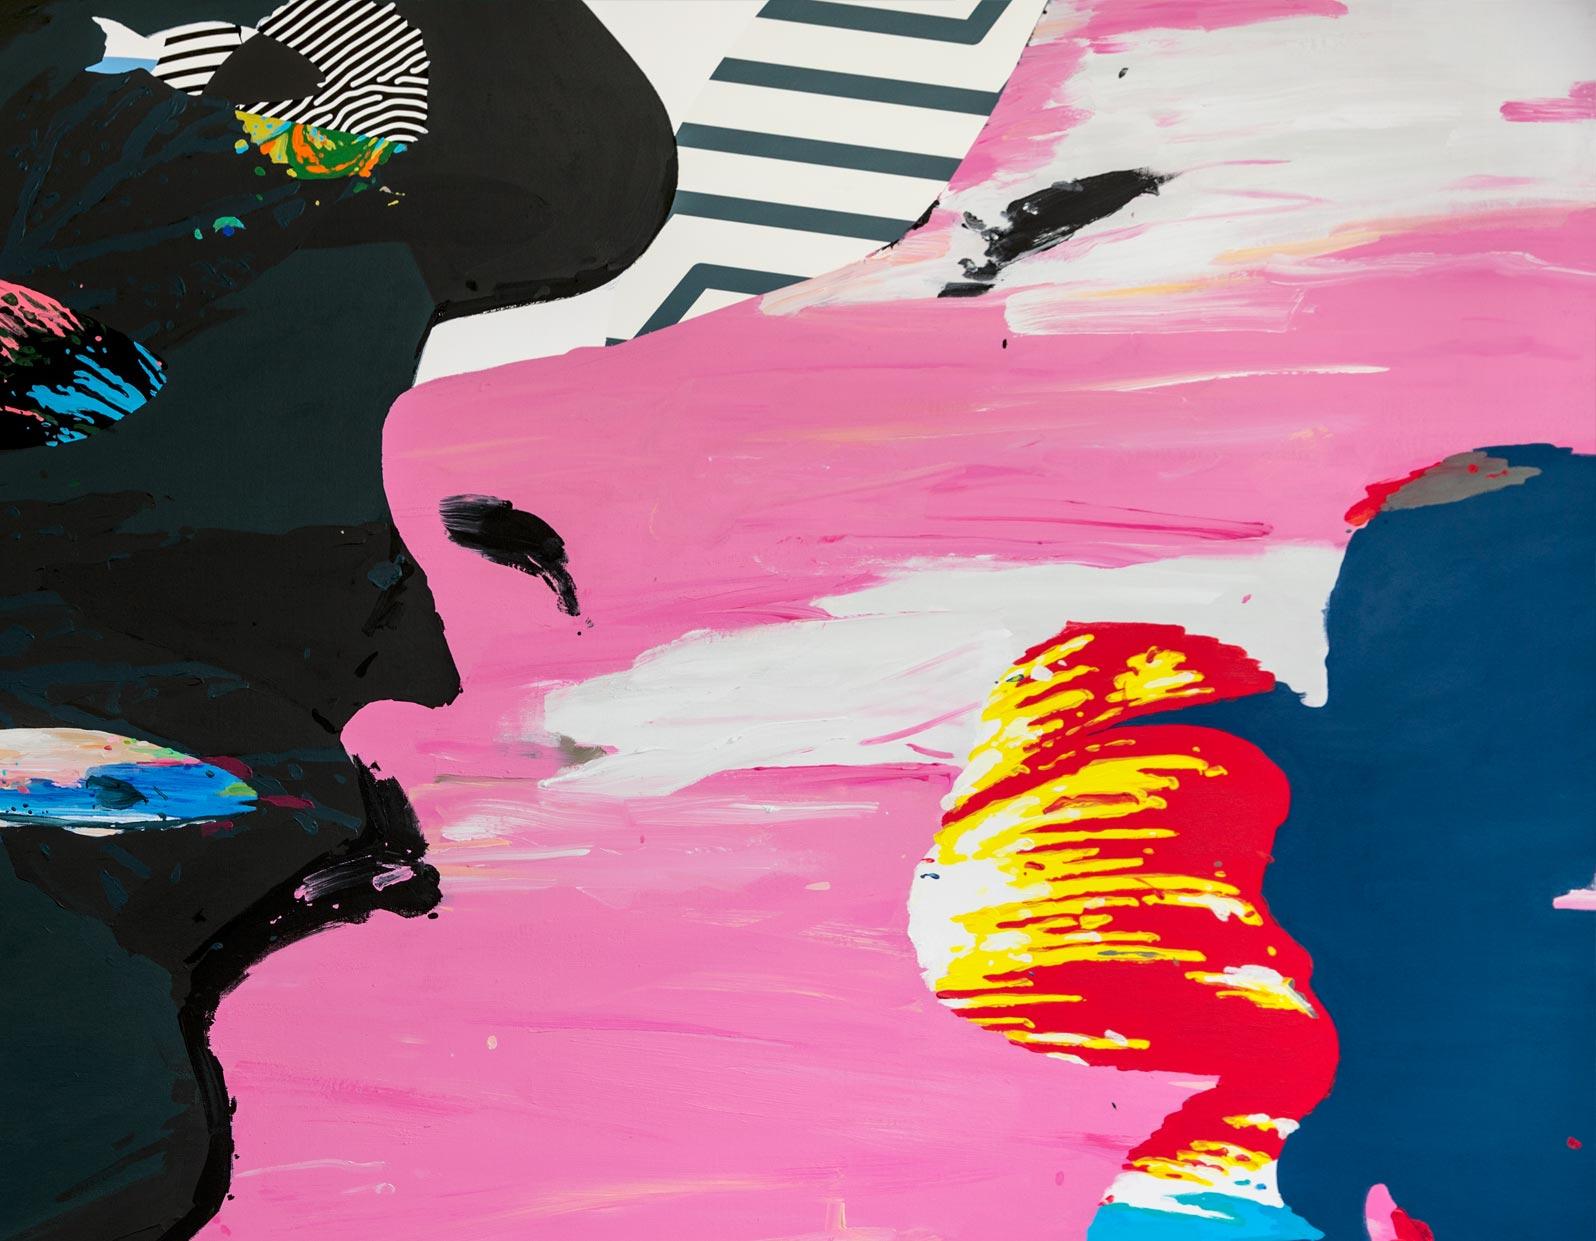 Anca Stefanescu | Contemporary Creative Painter, Influo